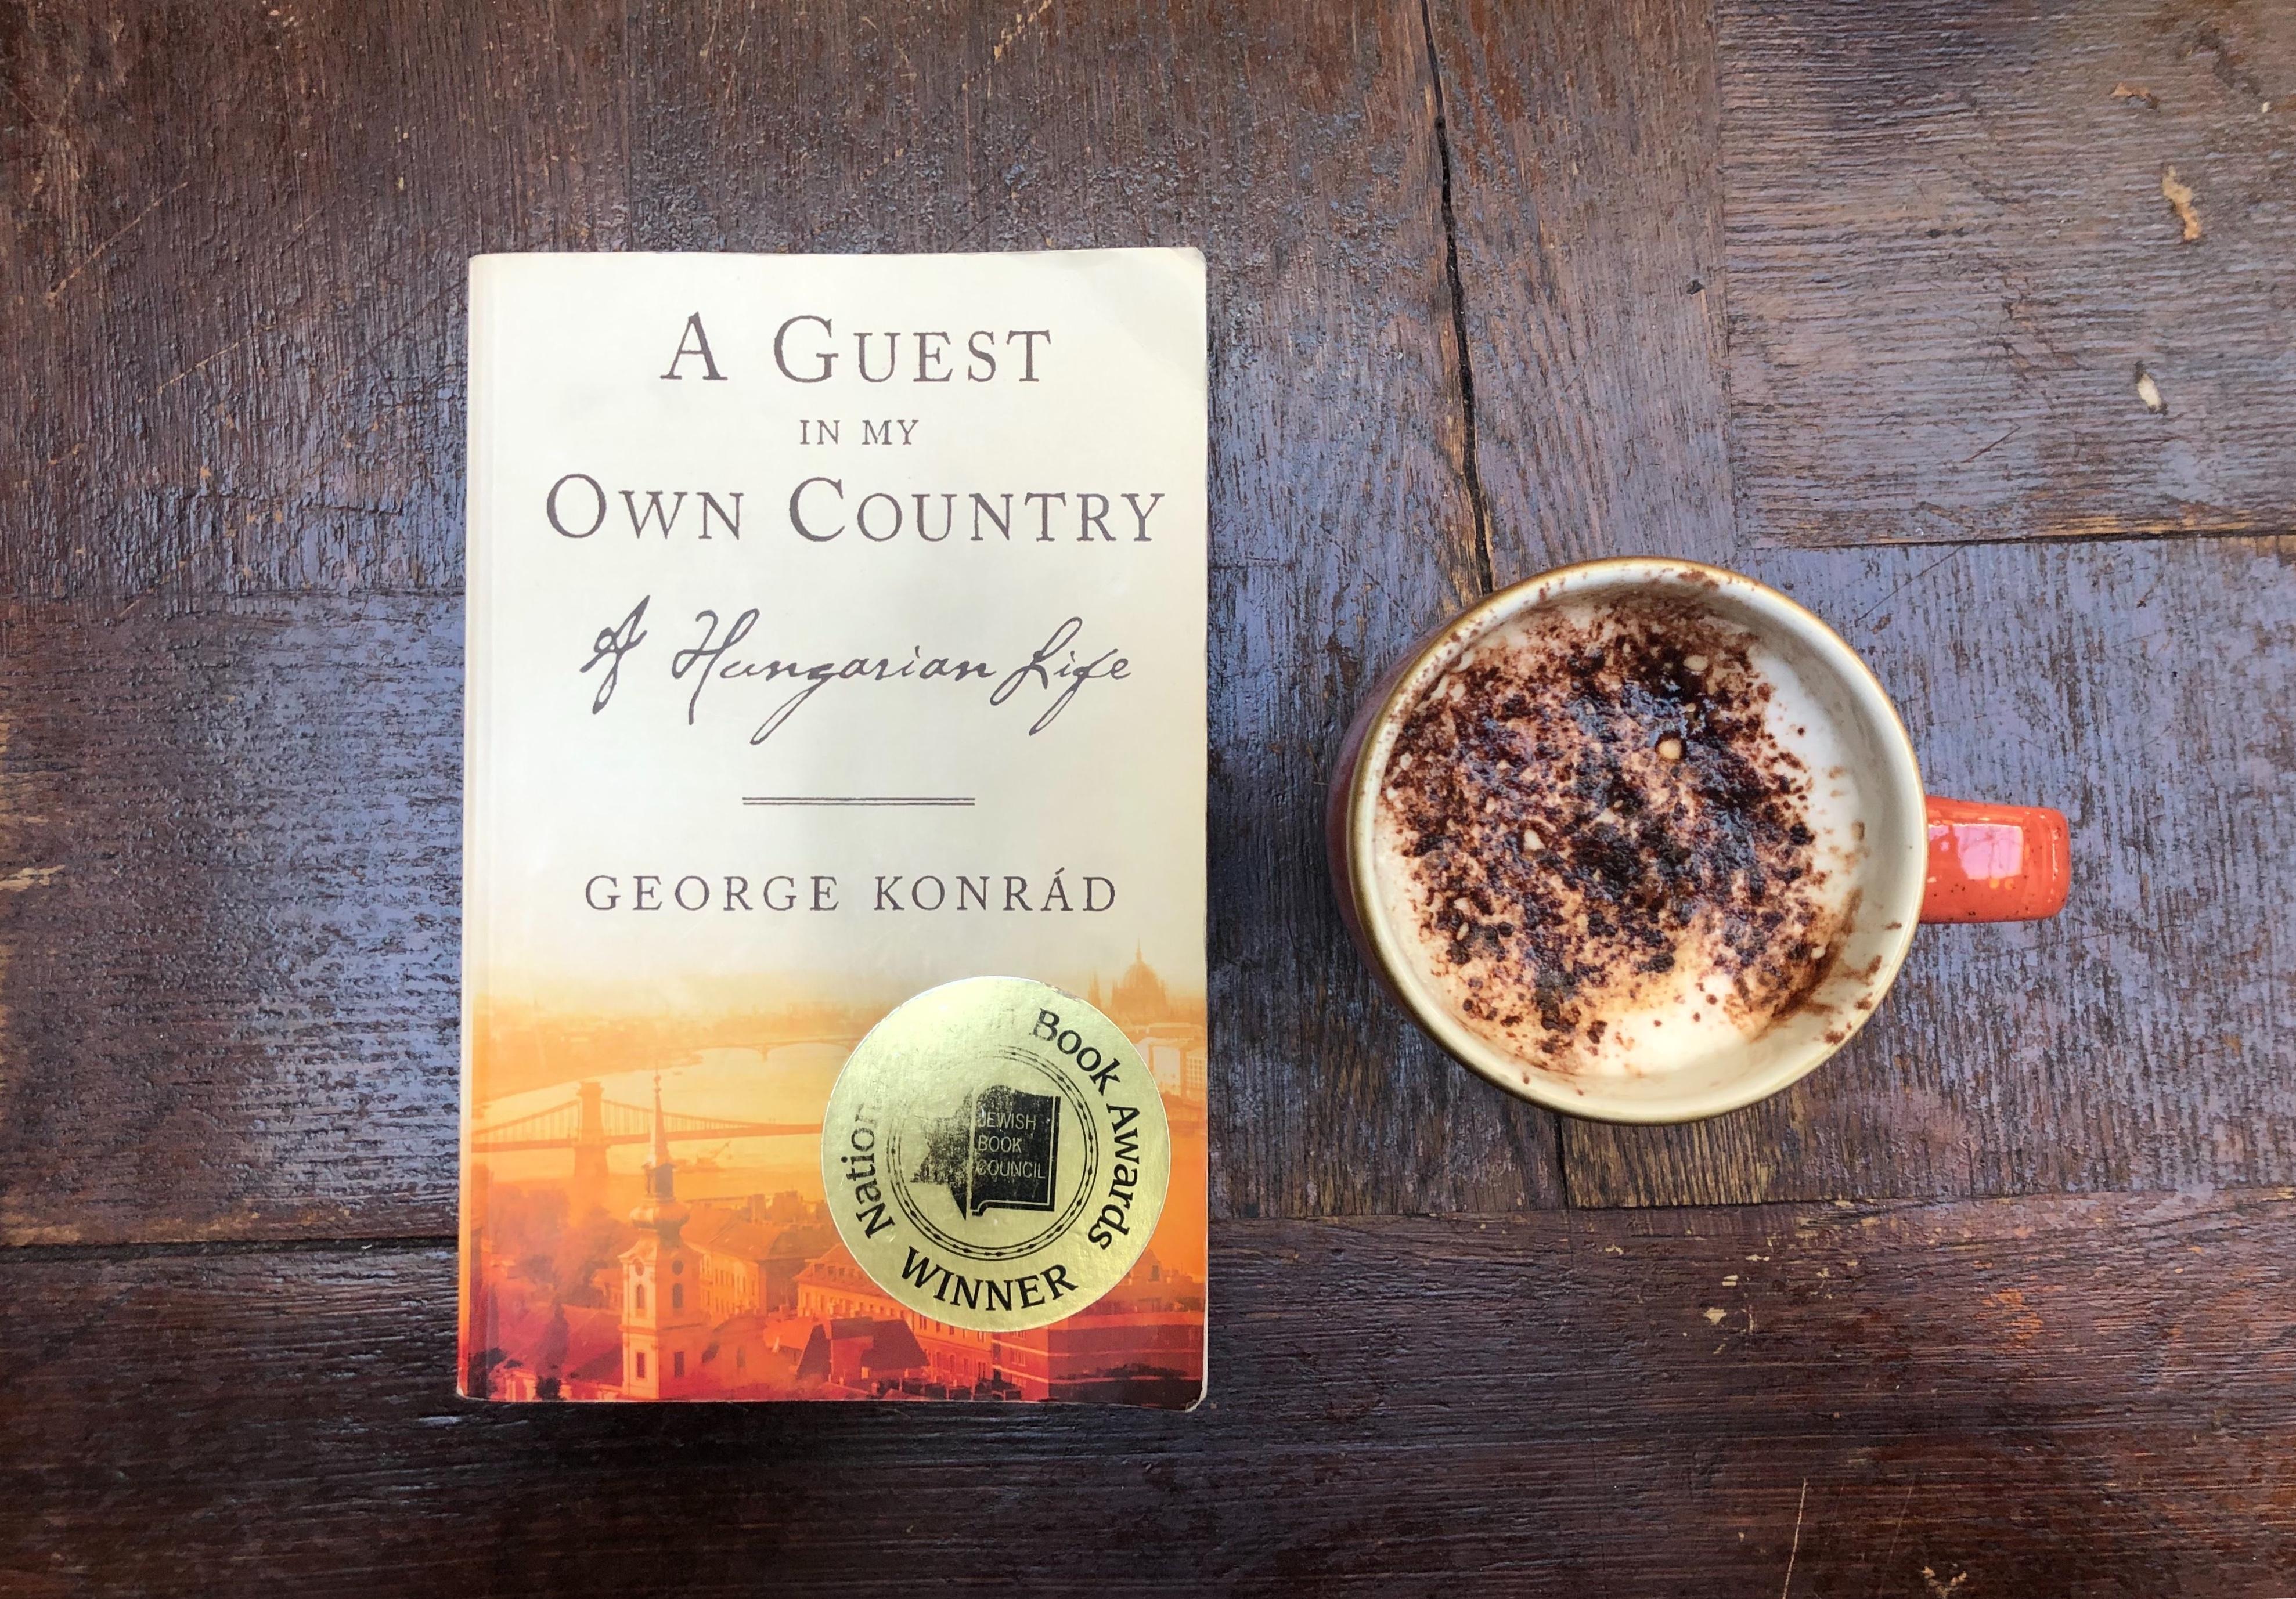 Livro da Hungria, A Guest in my Own Country, George Konrad